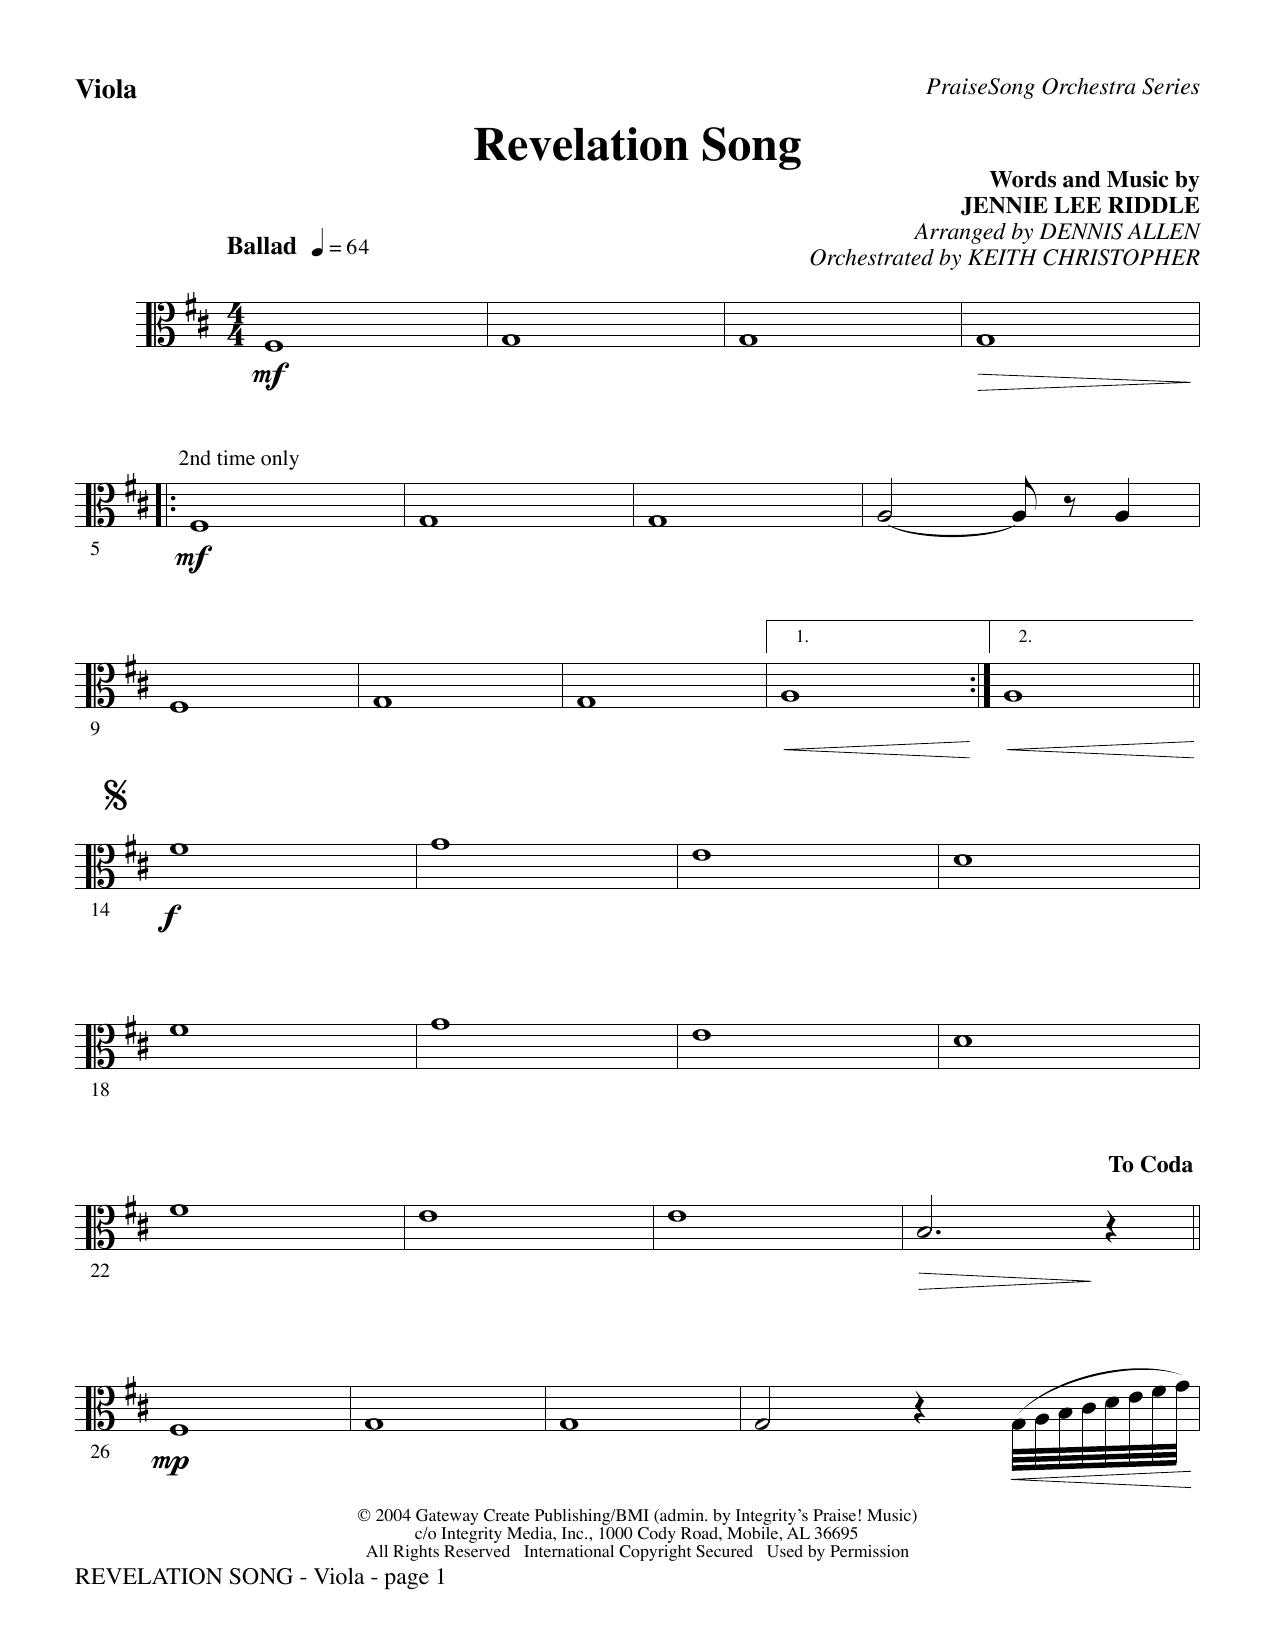 Revelation Song - Viola Sheet Music